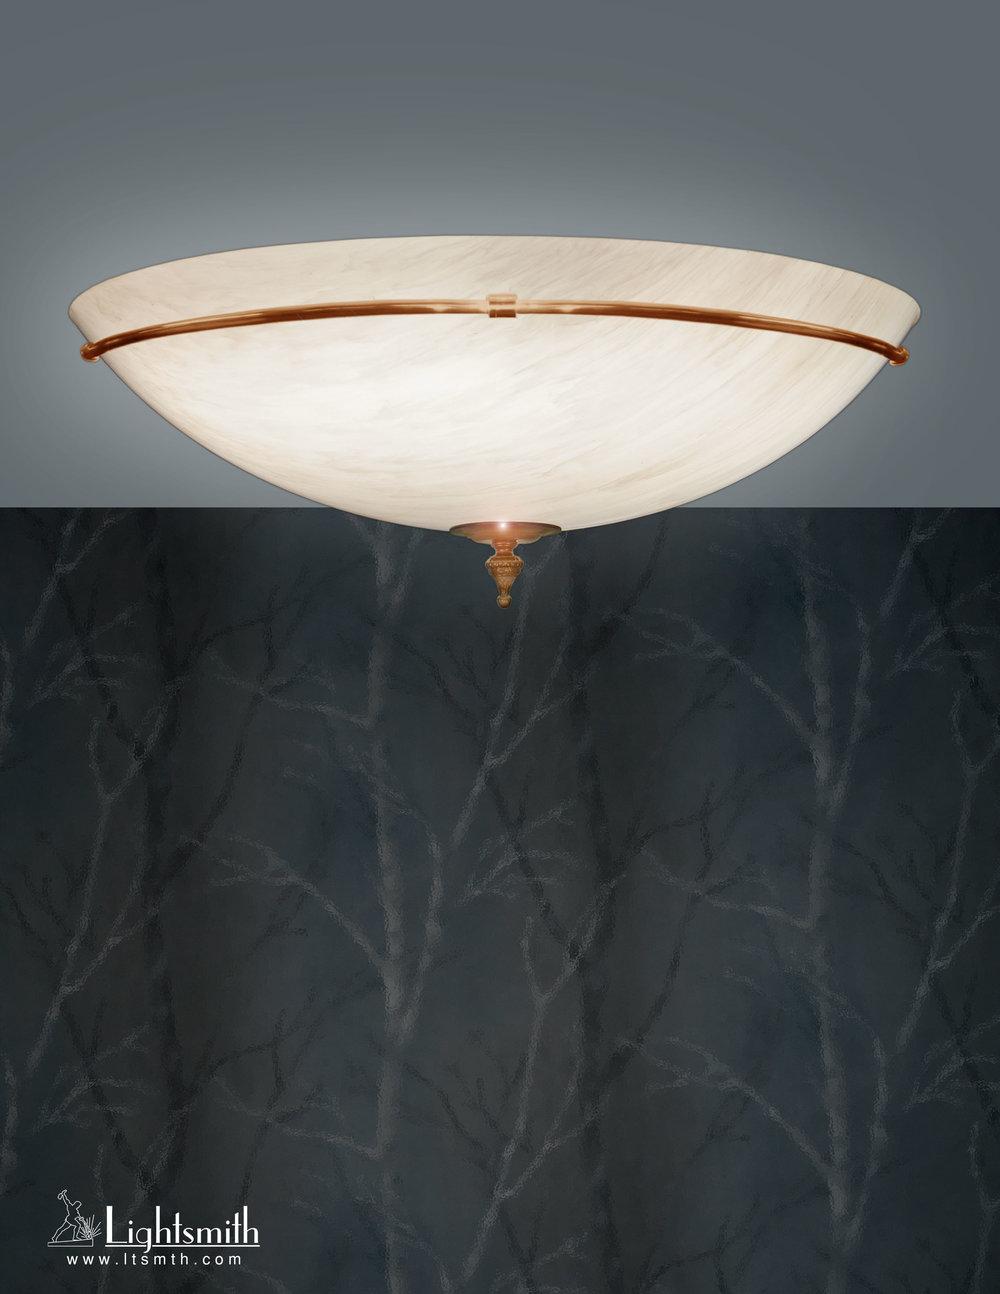 CL-504 - Burnished Bronze - Beige Alabaster Acrylic